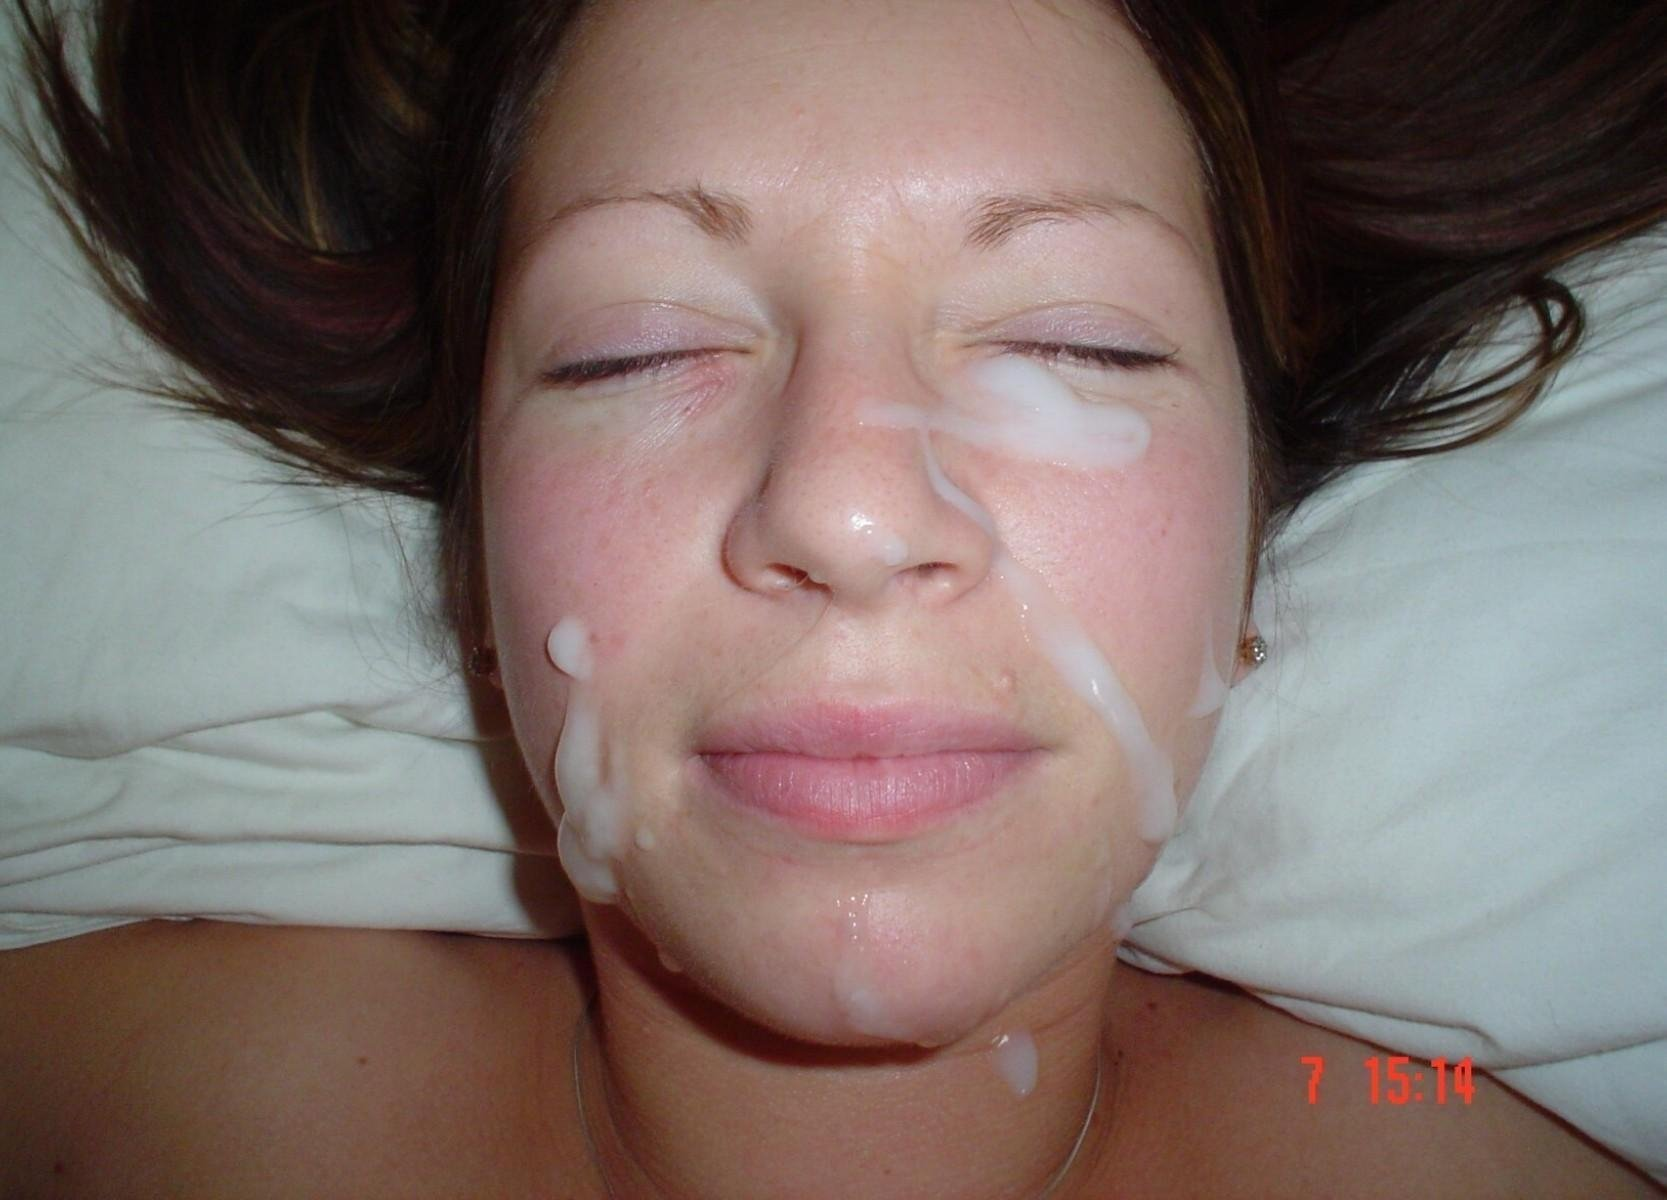 тоже диод сперма на лице якут фото подруга сможет